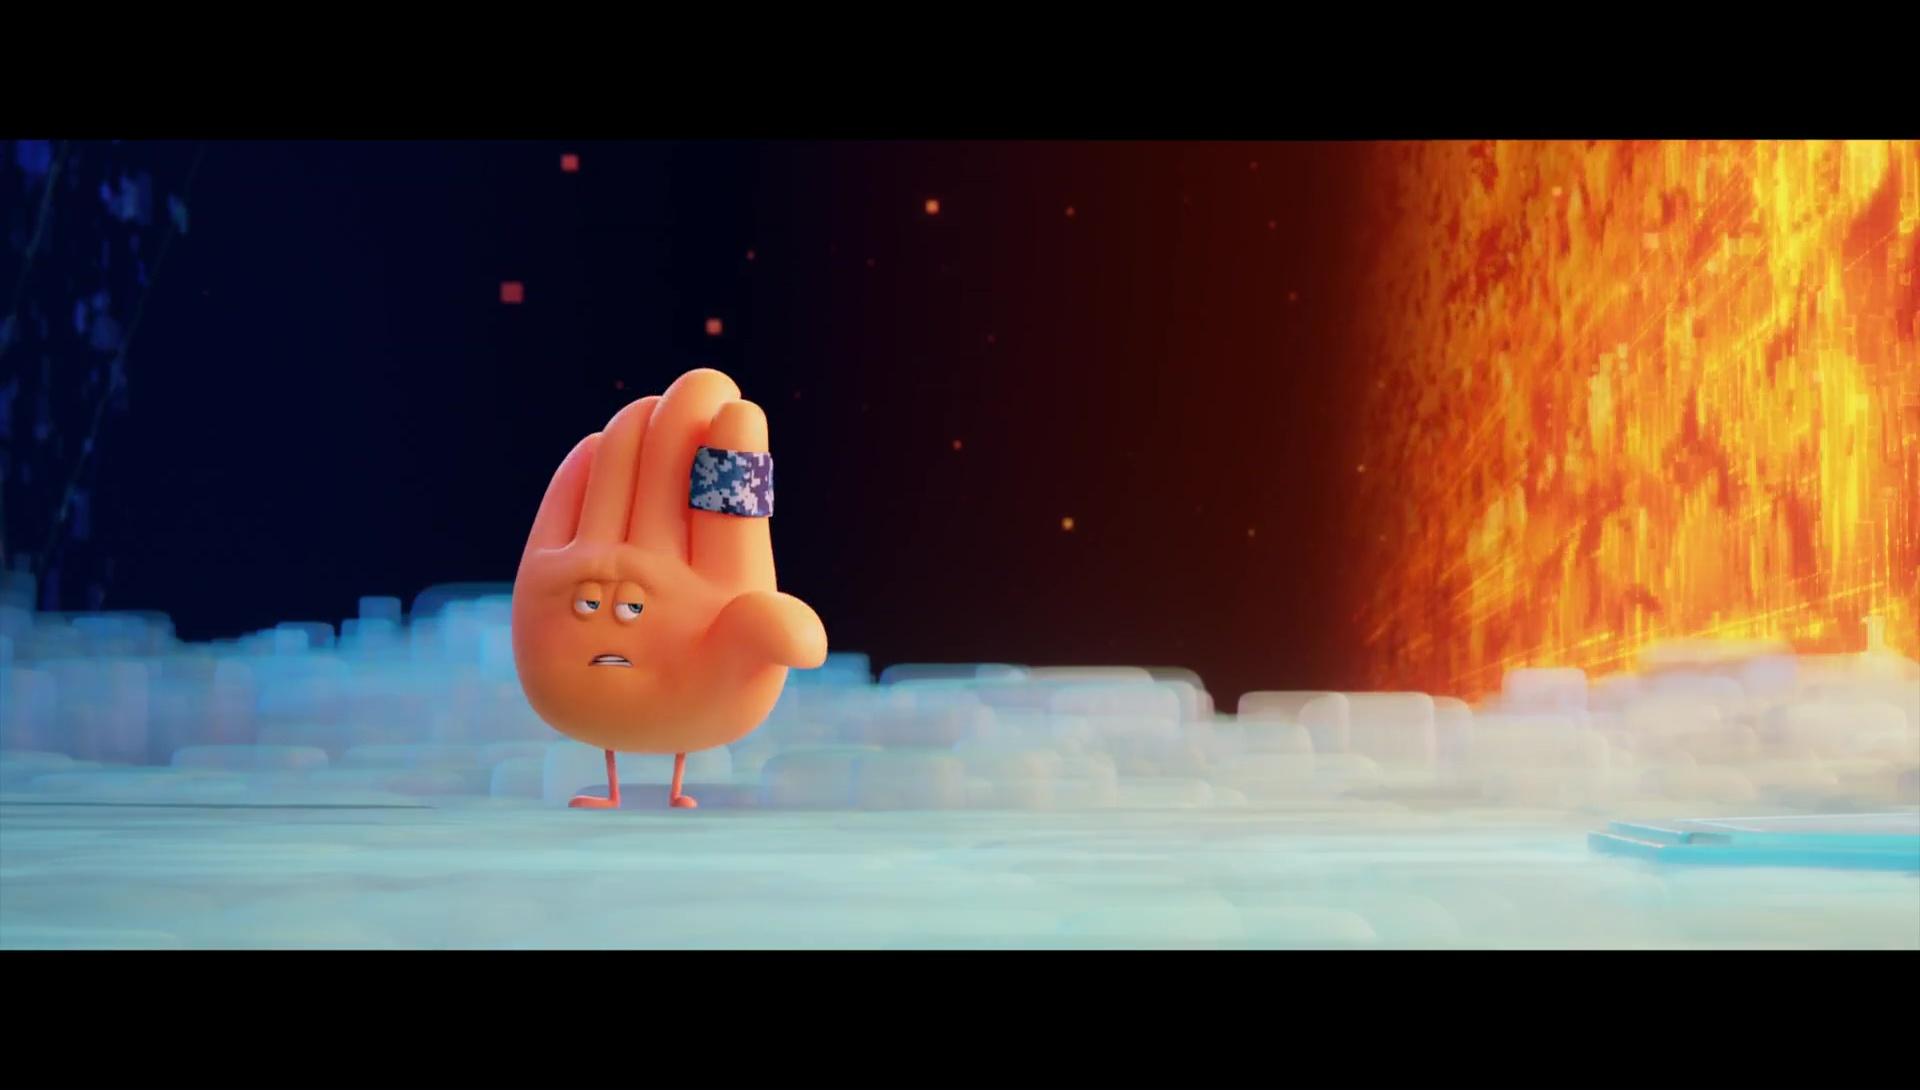 Emoji La Pelicula 1080p Lat-Cast-Ing 5.1 (2017)